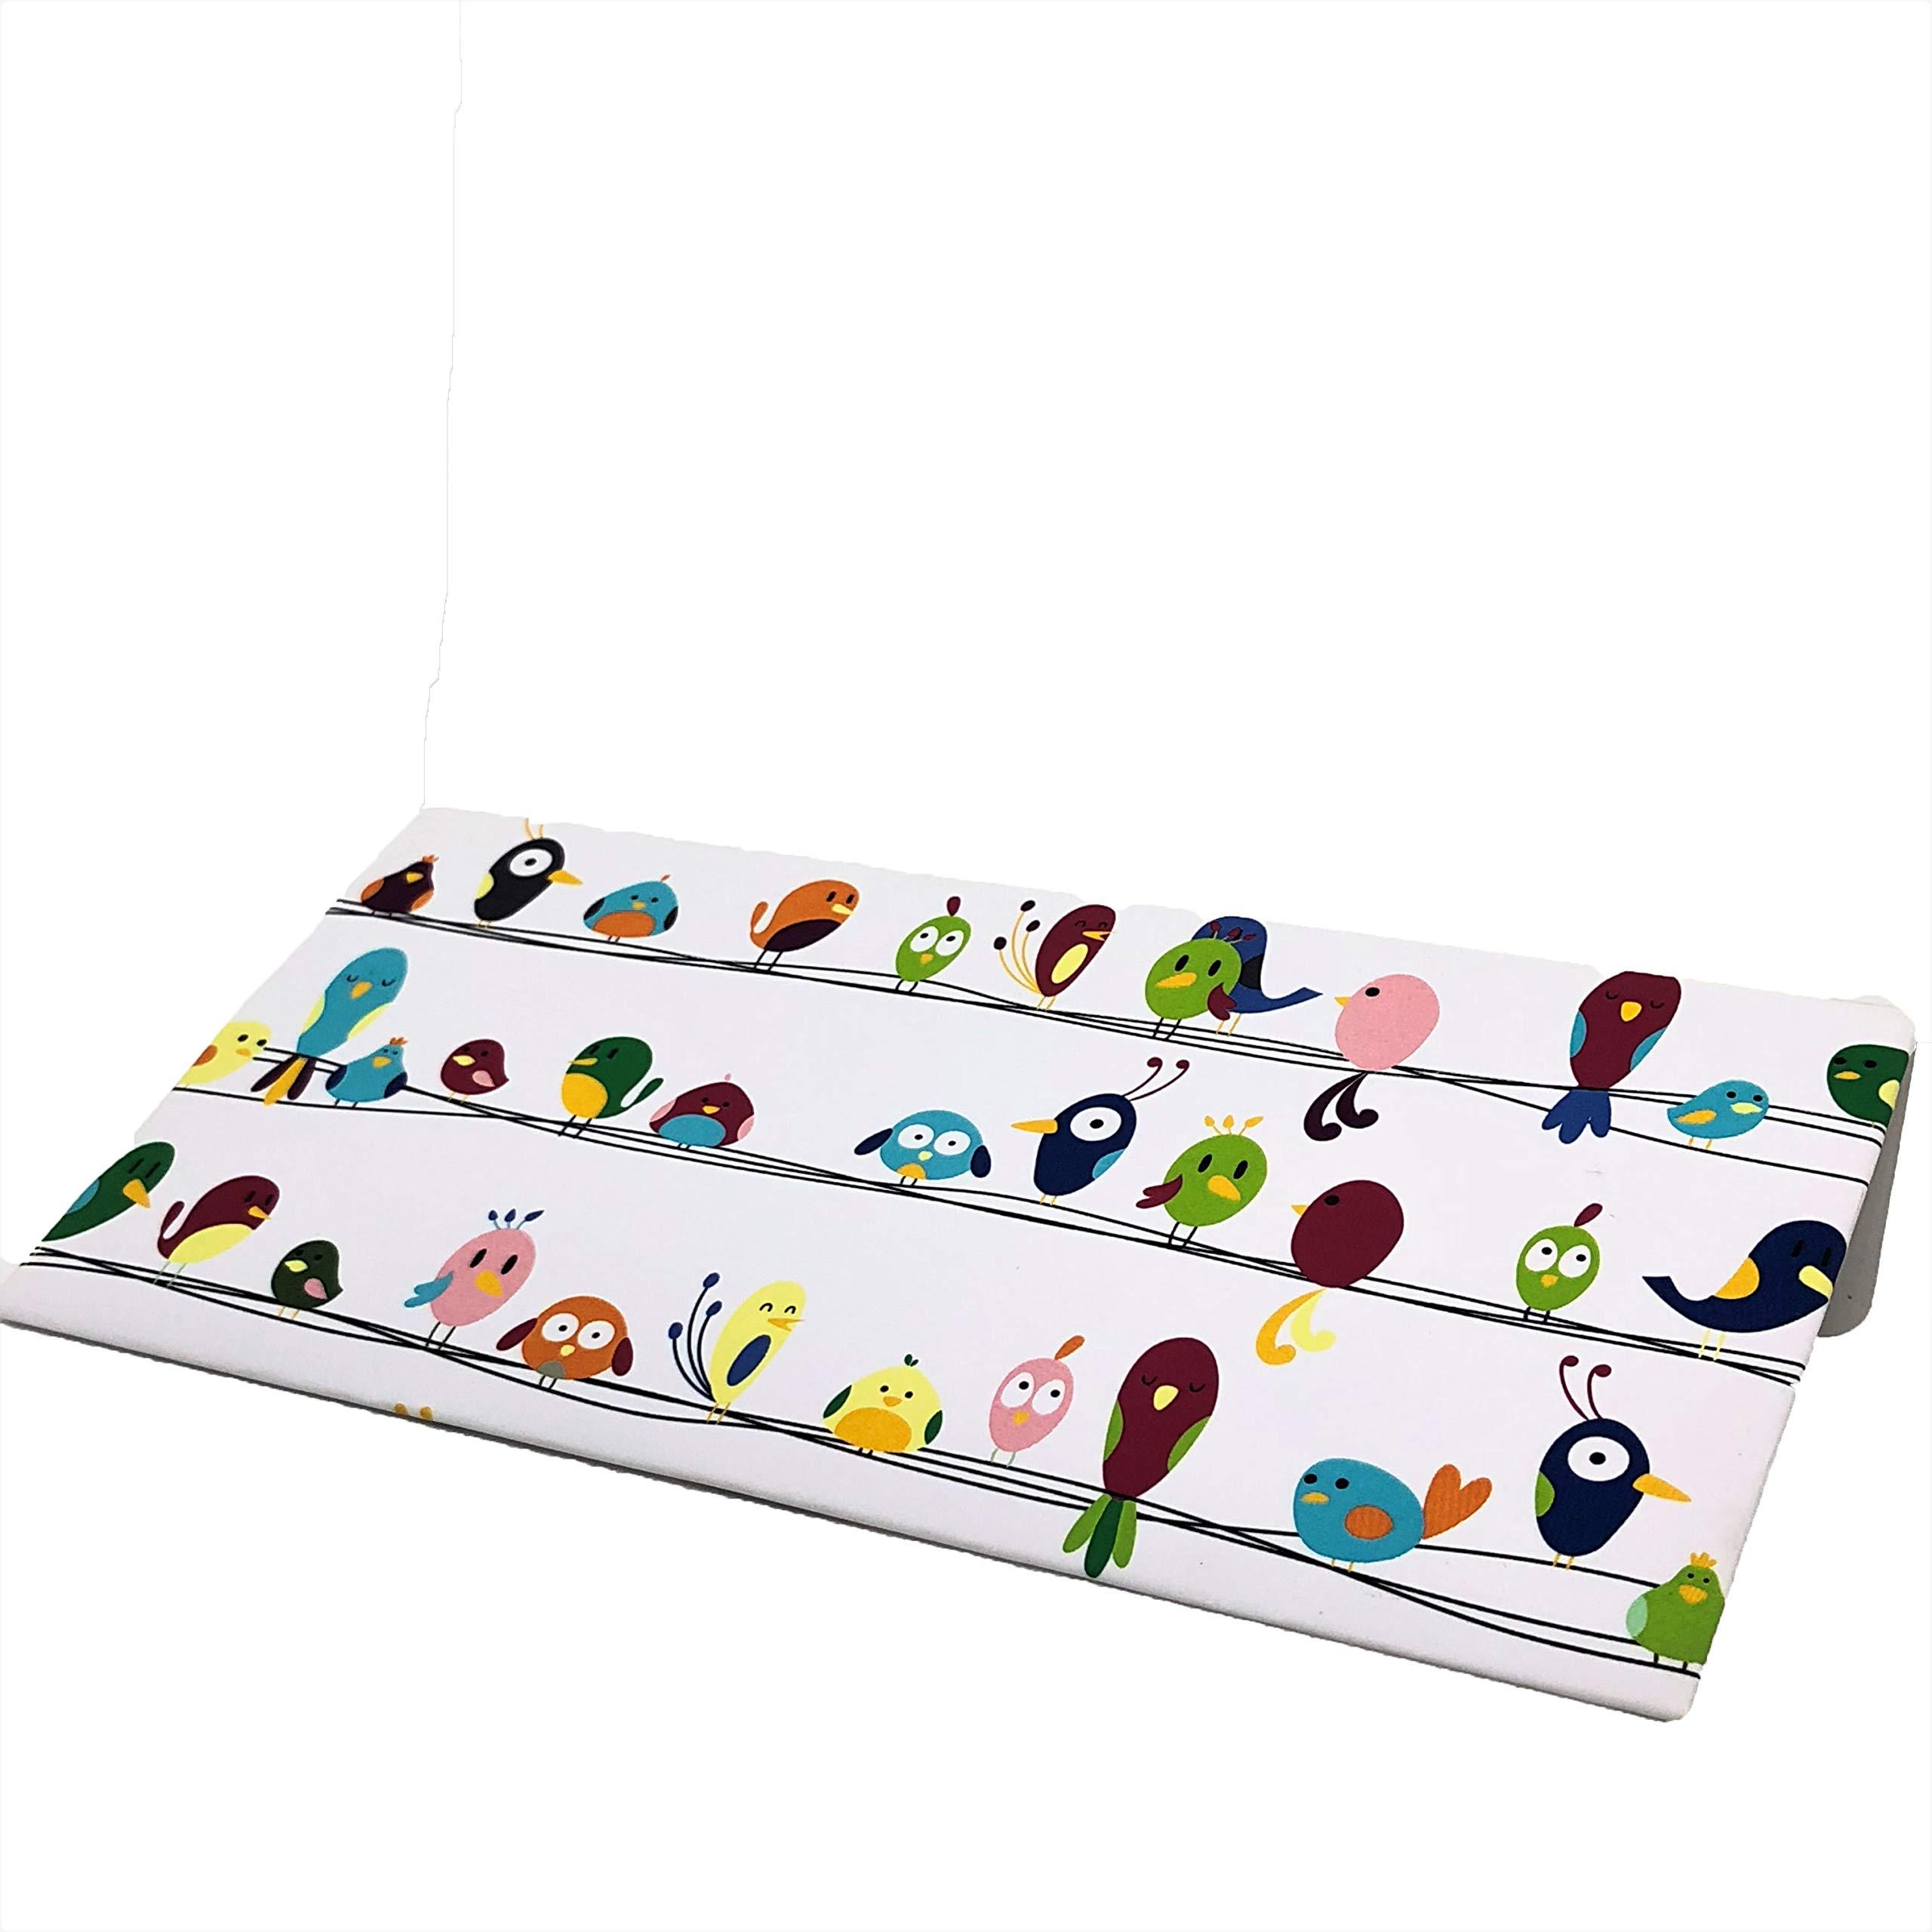 The Paper Workshop Cute Animals Cash Envelopes/Sagan Envelope/Shagun Envelopes - Pack of 5 Envelopes (B07N1PBJBQ) Amazon Price History, Amazon Price Tracker